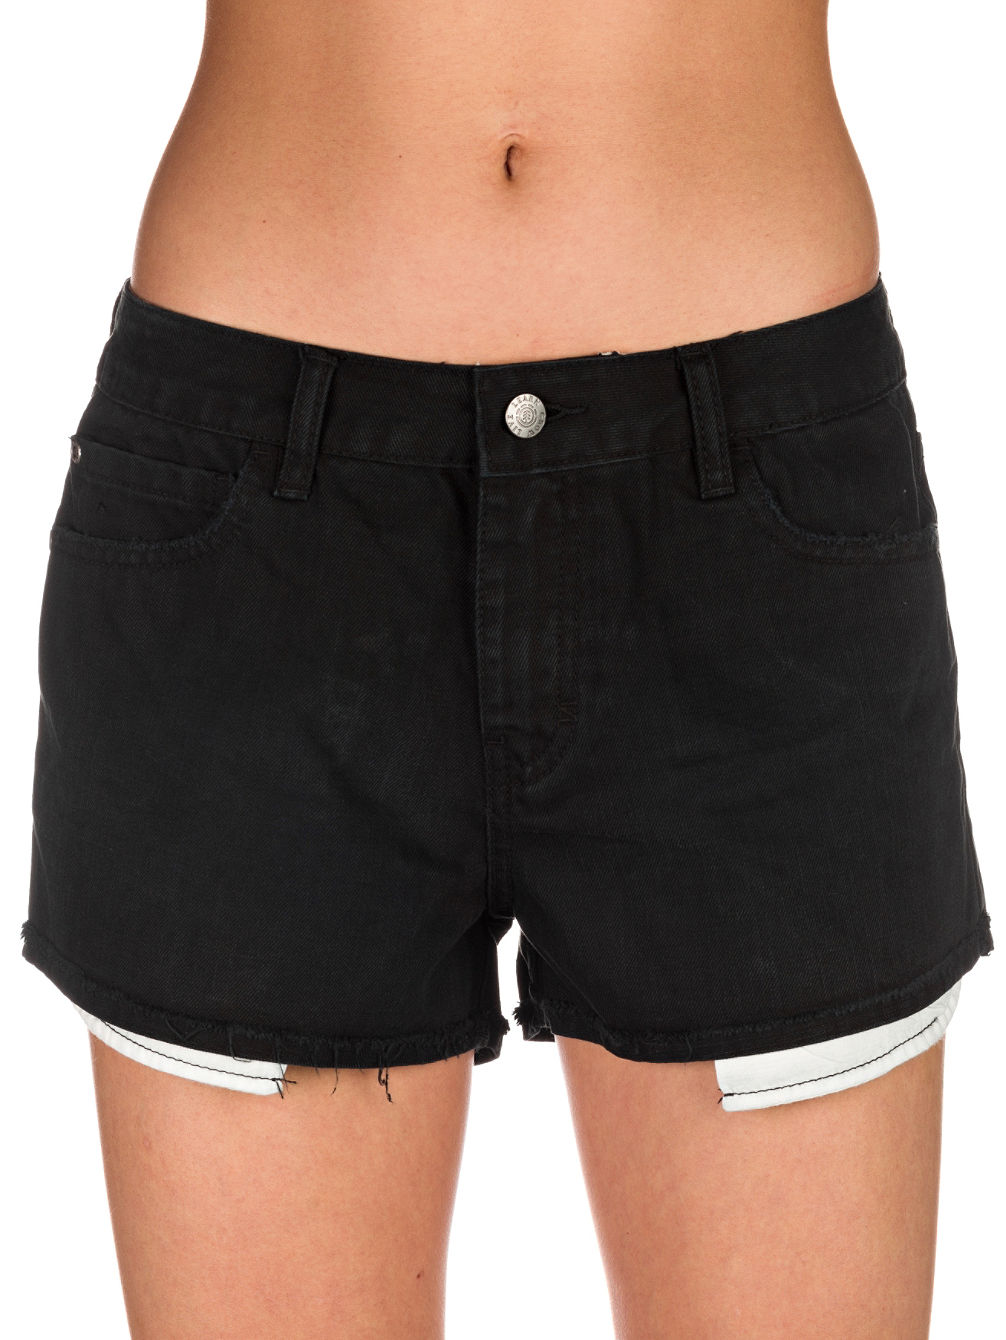 element-river-shorts